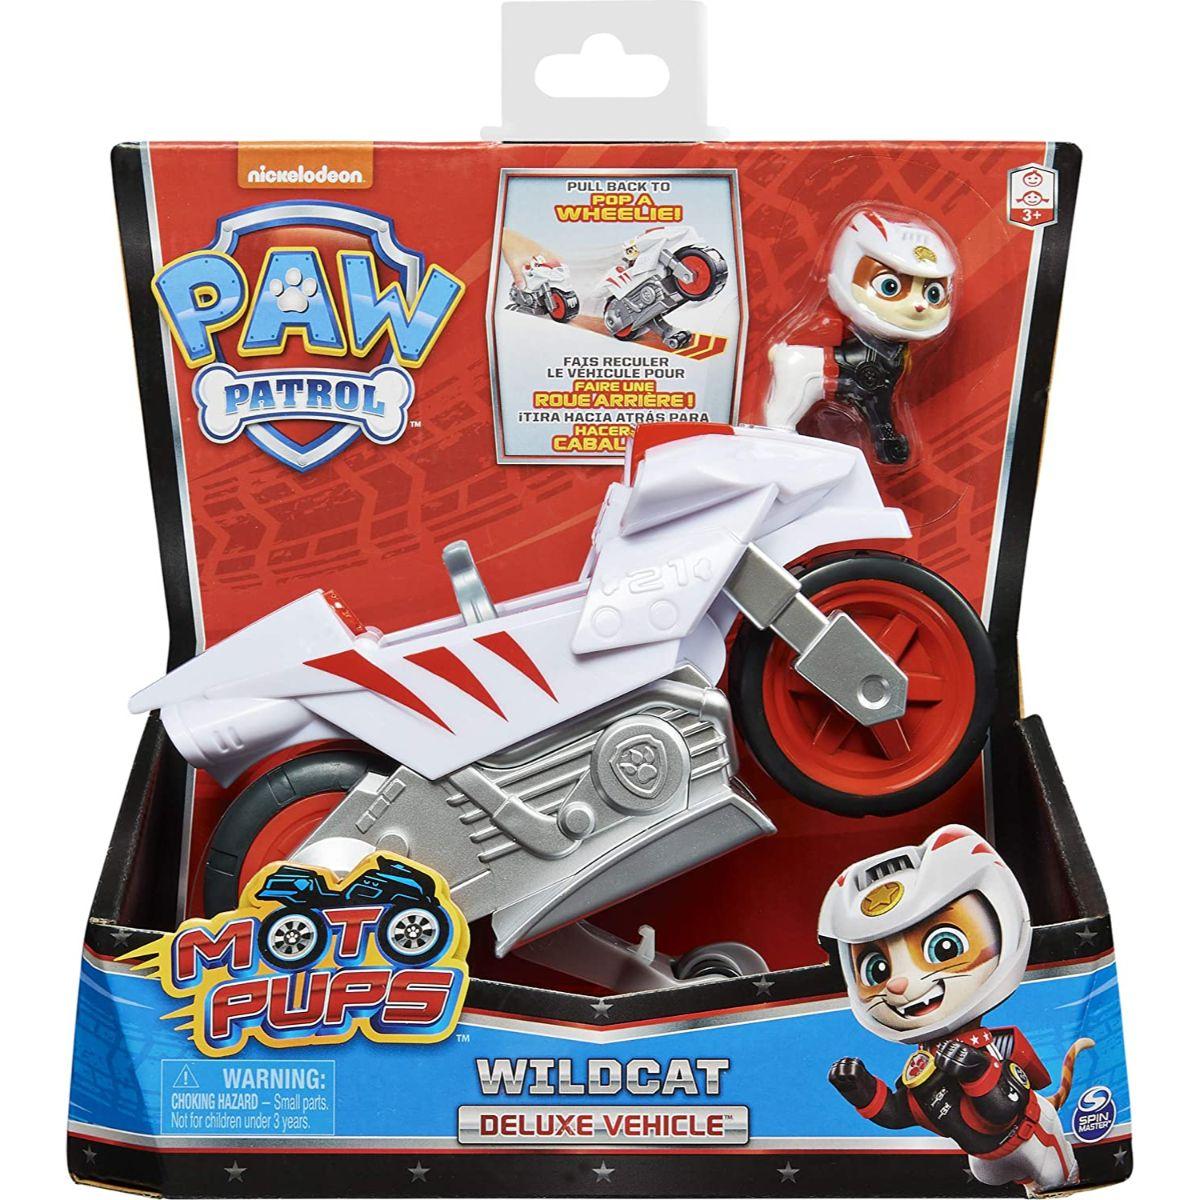 Motocicleta si figurina Paw Patrol Moto Pups, Wildcat, 20130047